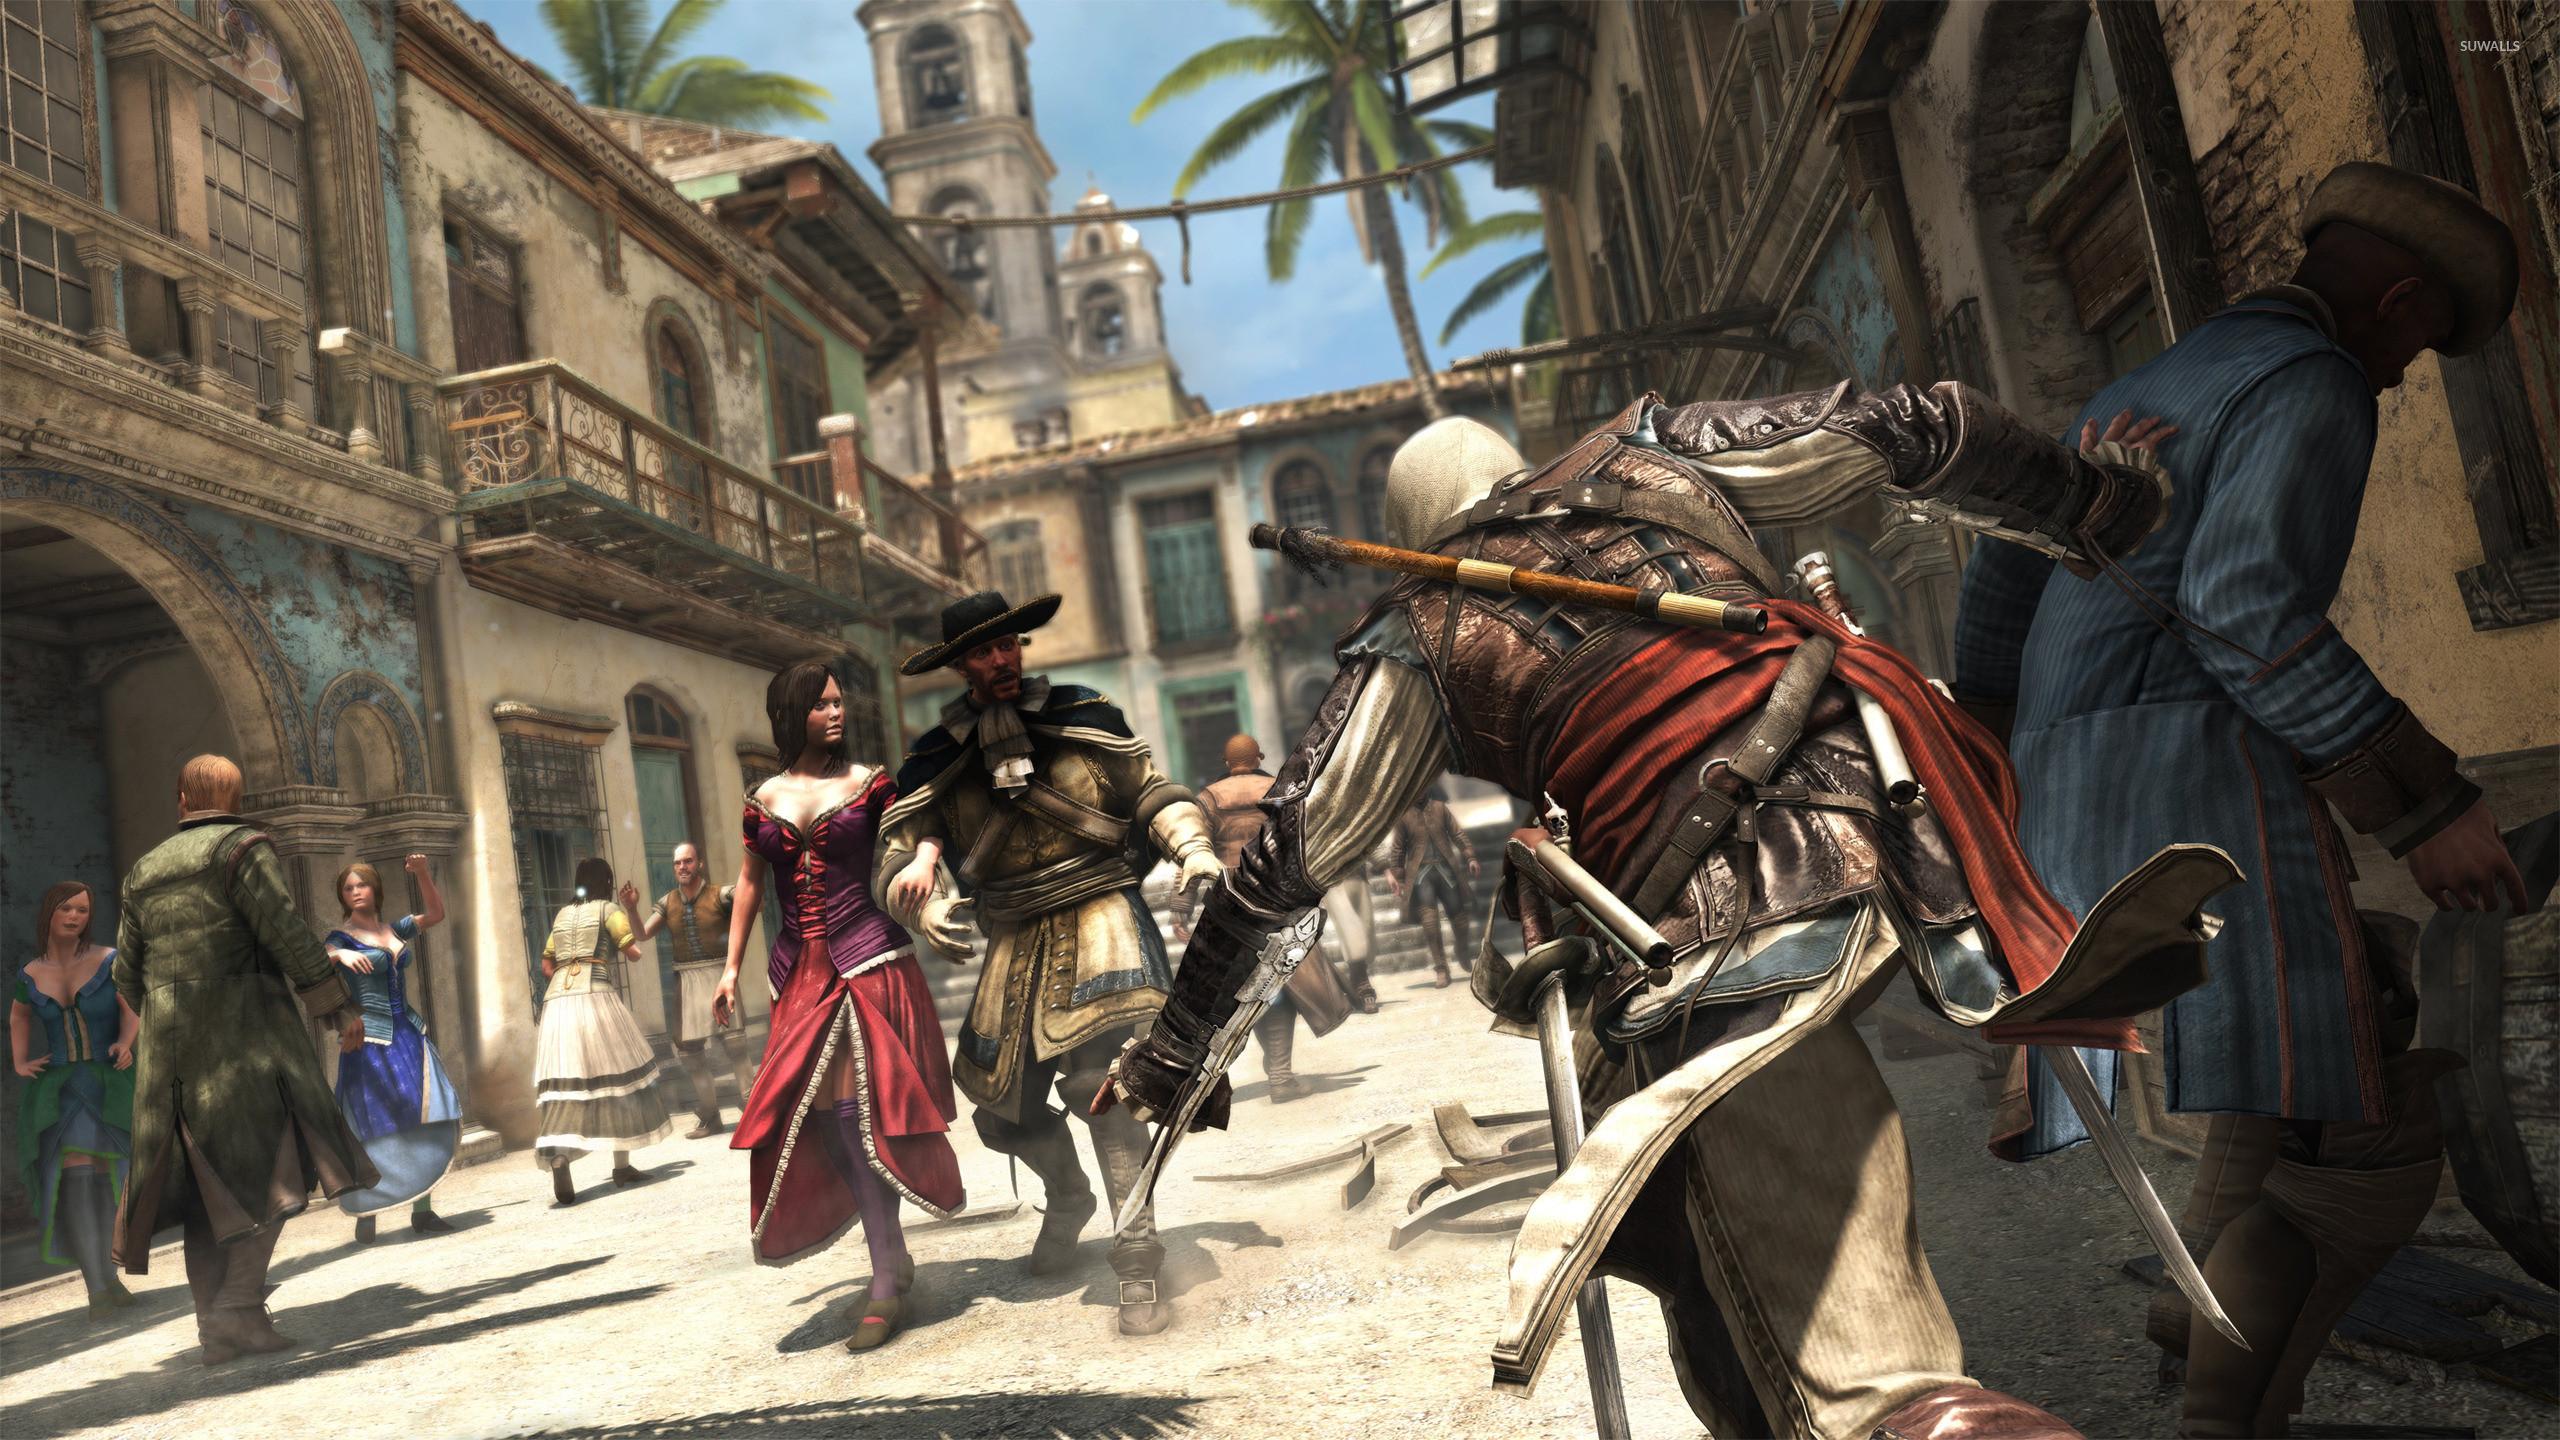 Assassin's Creed IV: Black Flag [11] wallpaper jpg